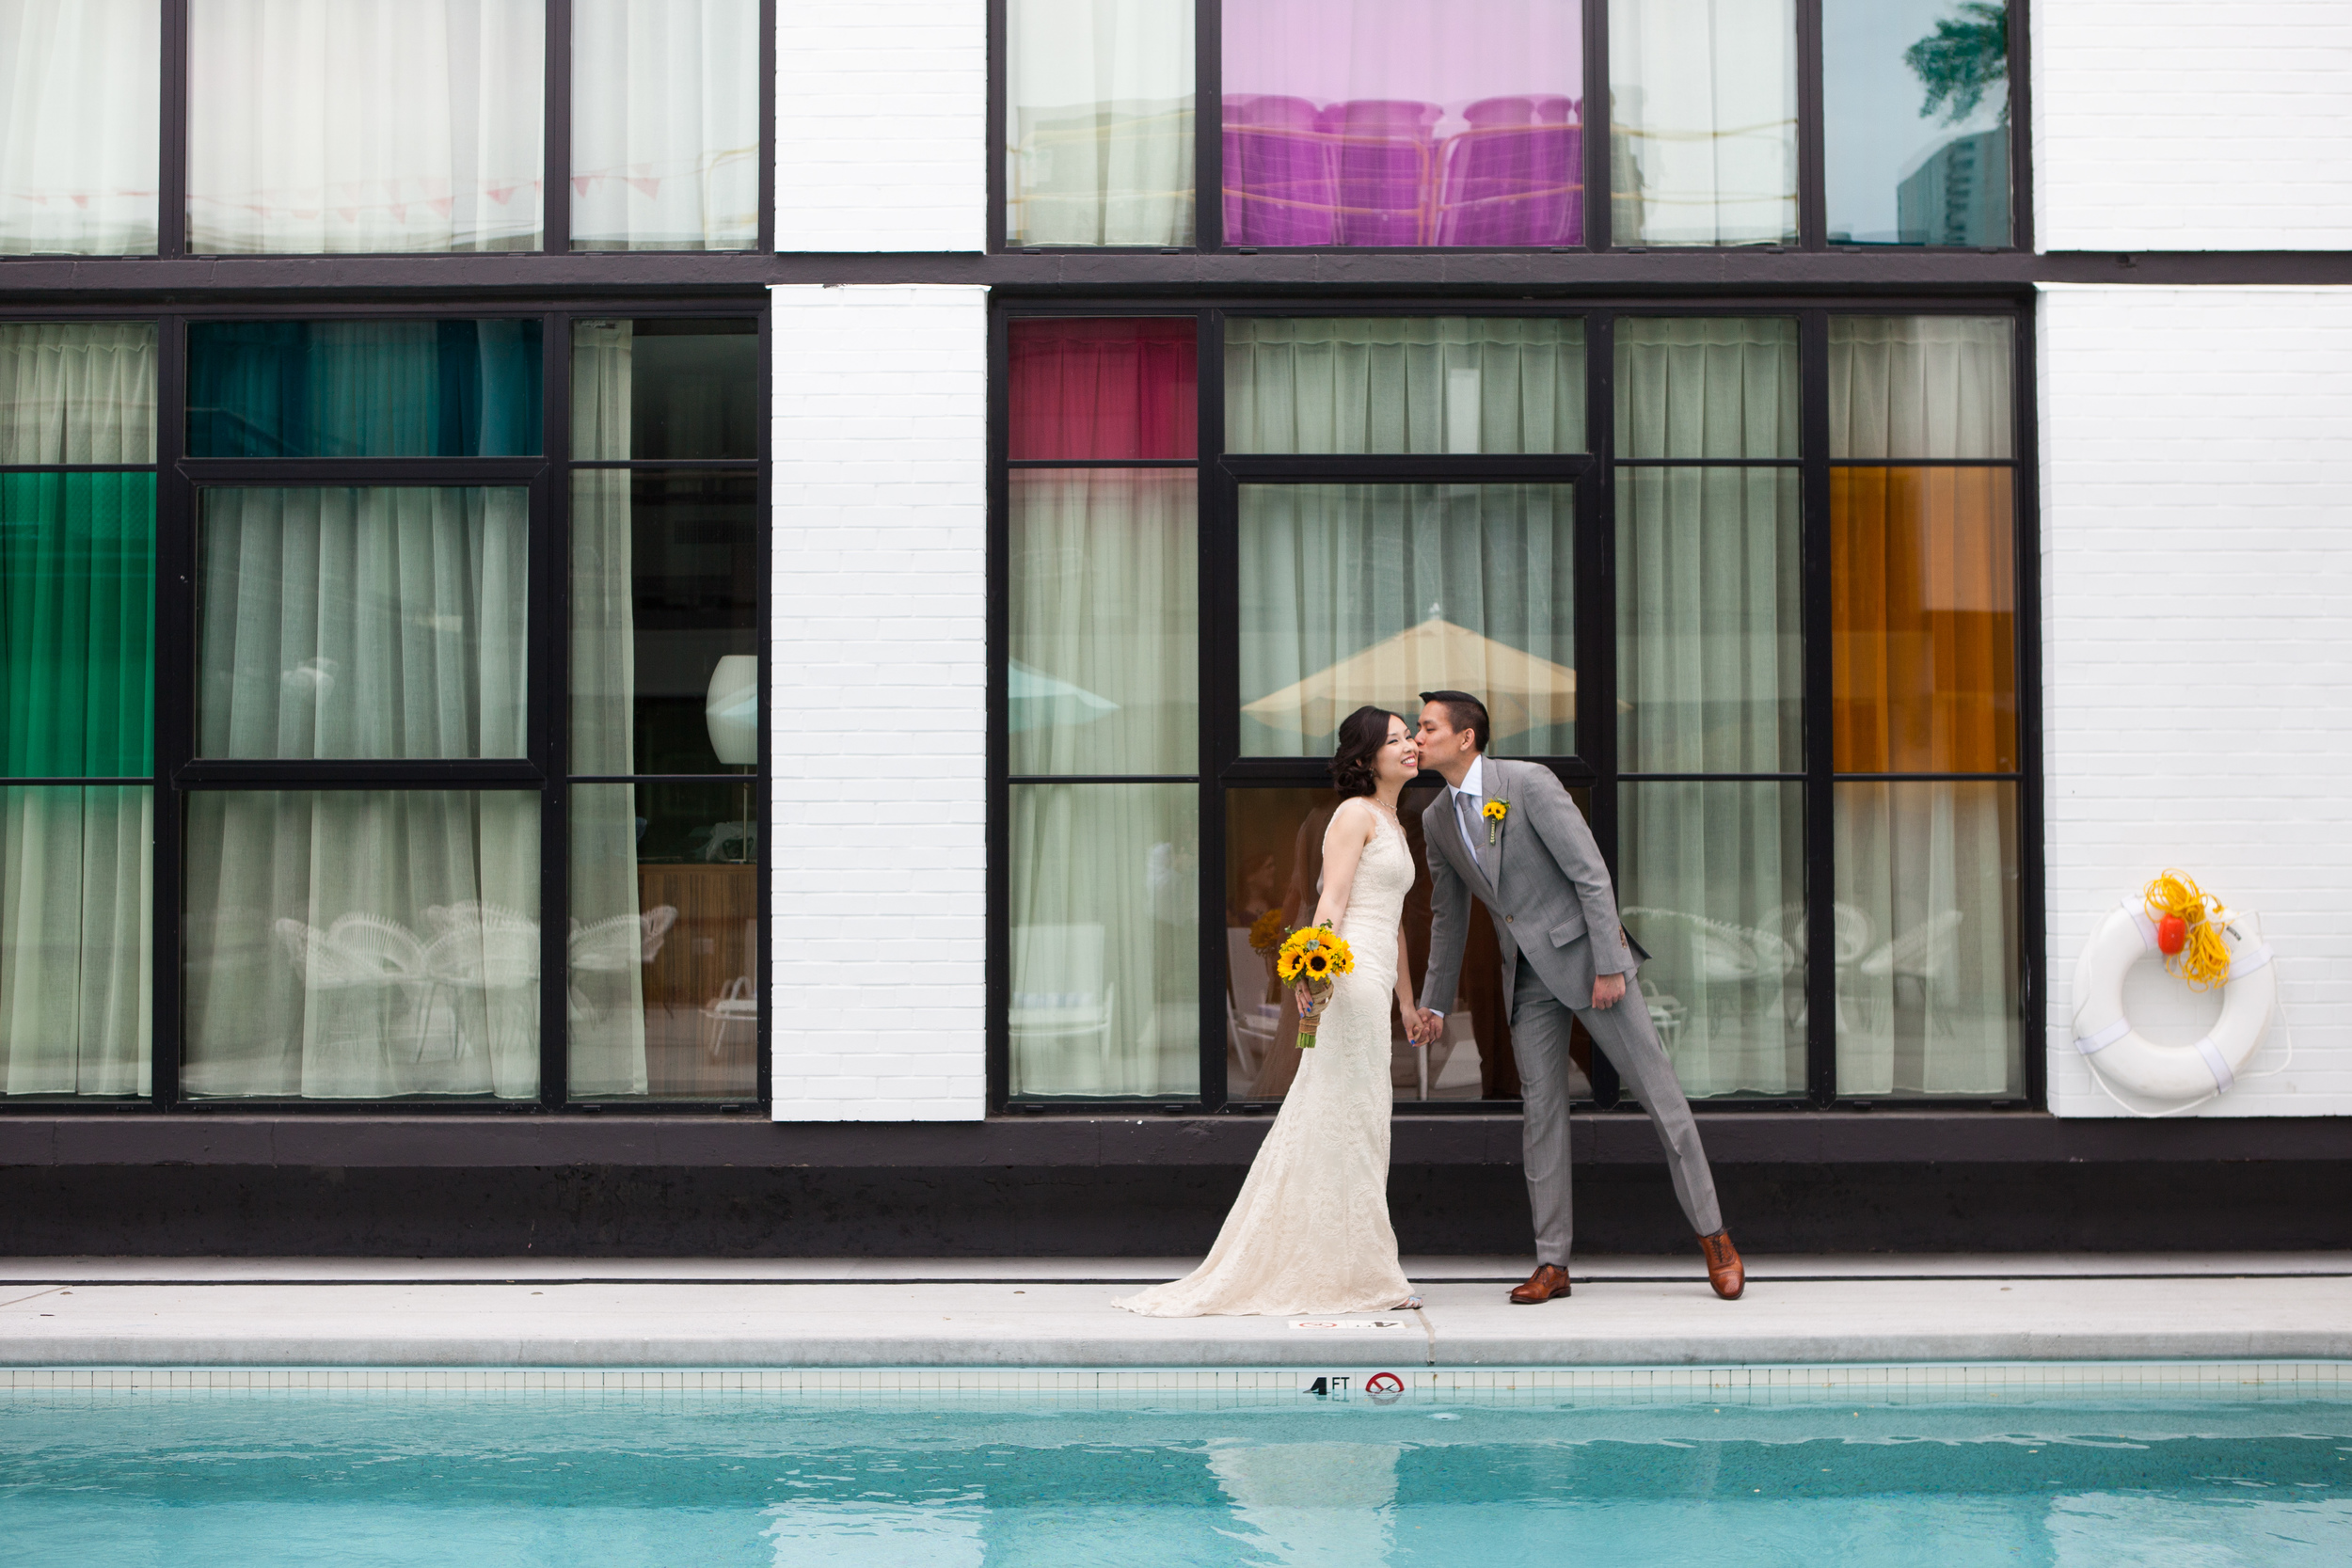 verb hotel wedding |jp langlands photography